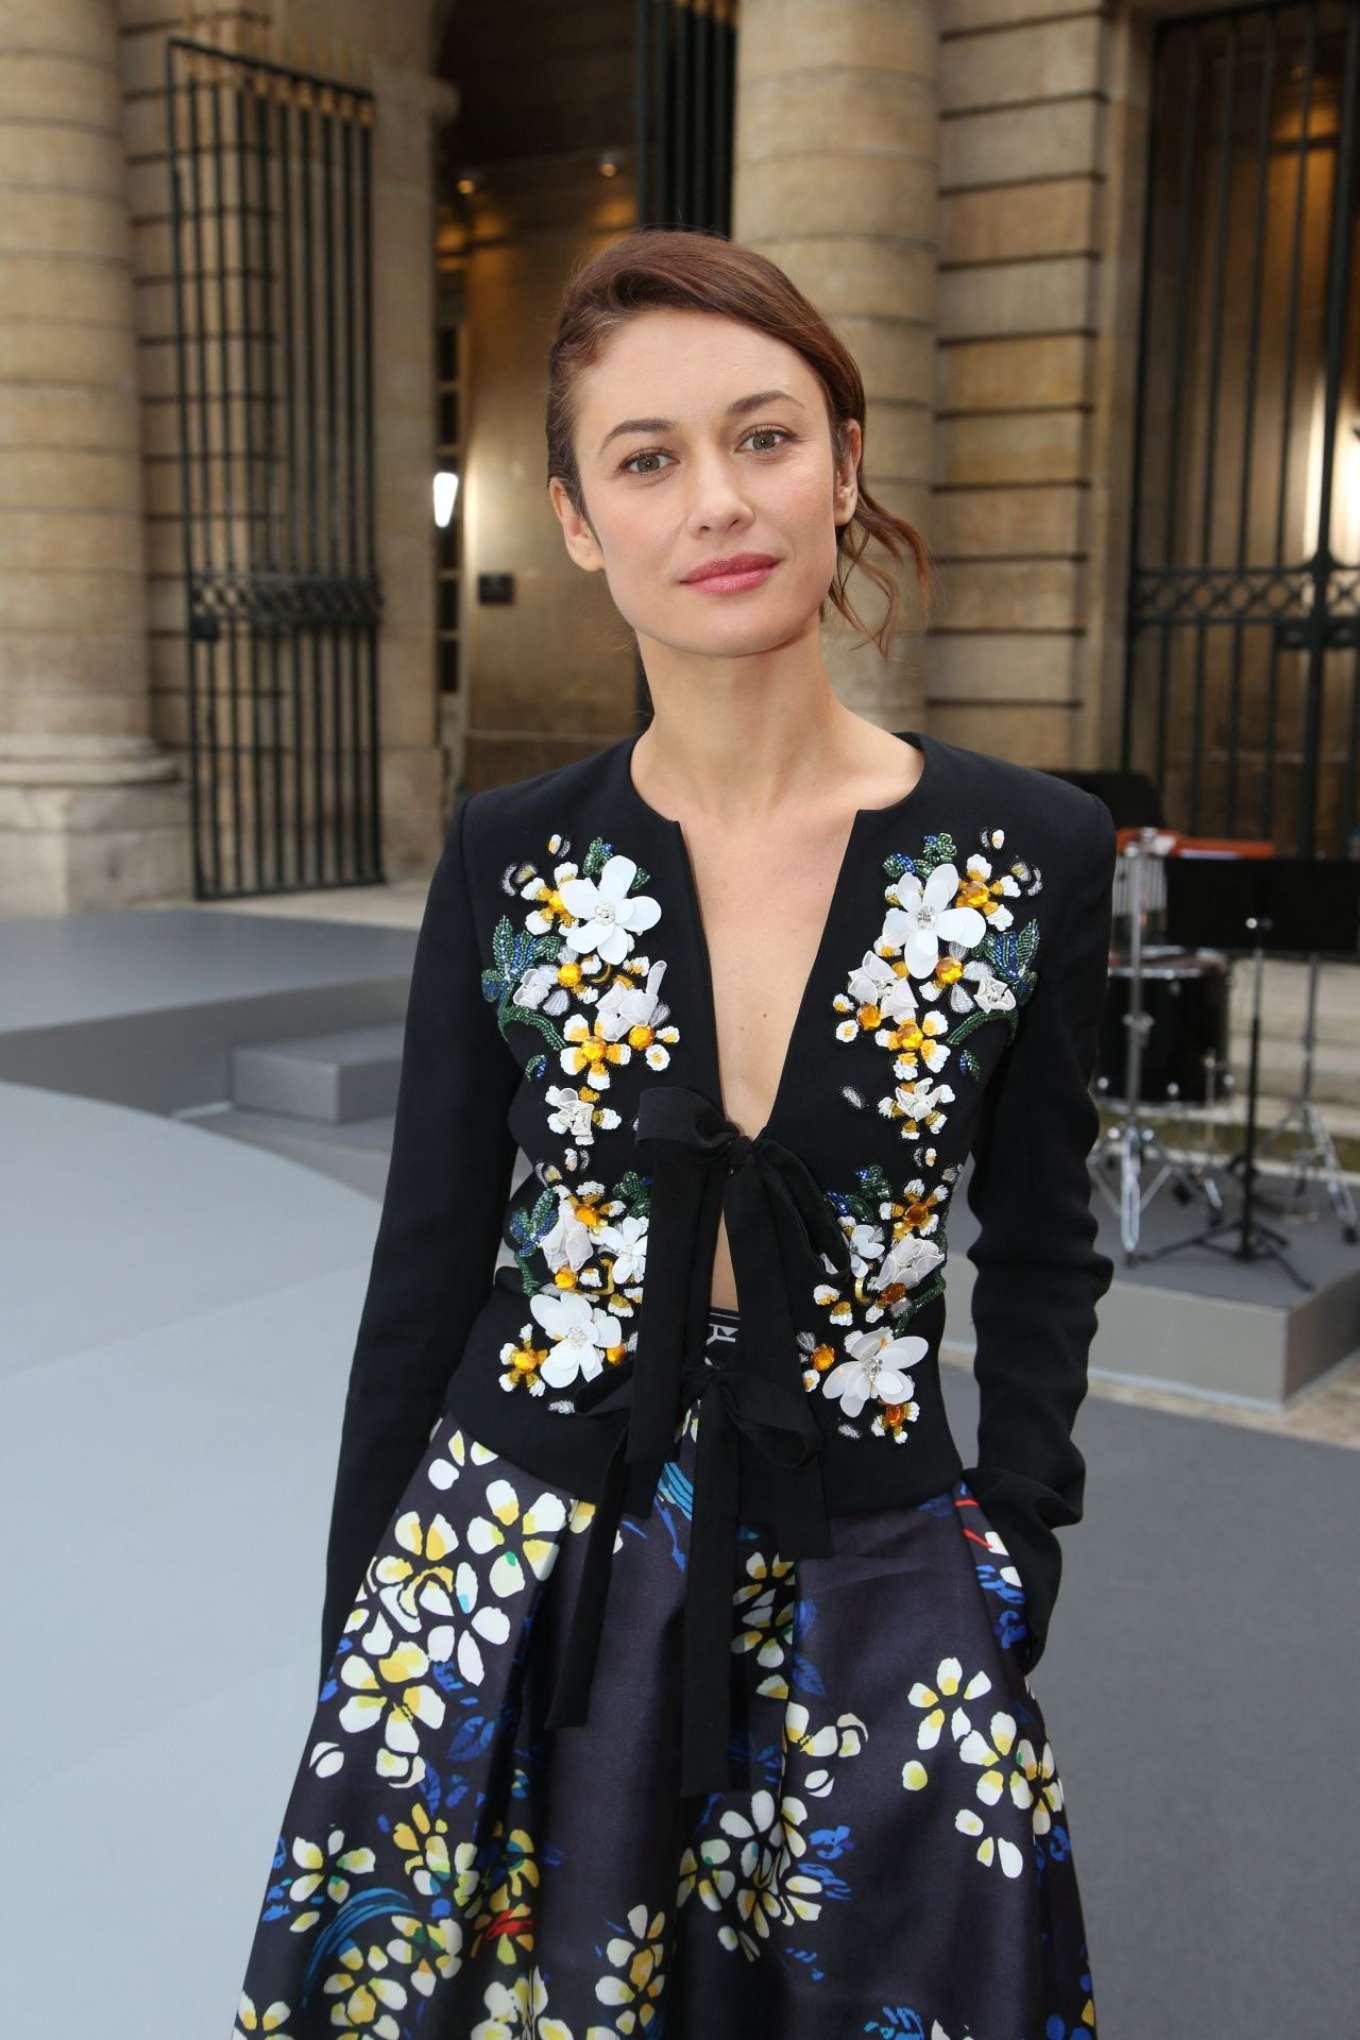 Olga Kurylenko - Le Defile L'Oreal Paris Runway Show in Paris